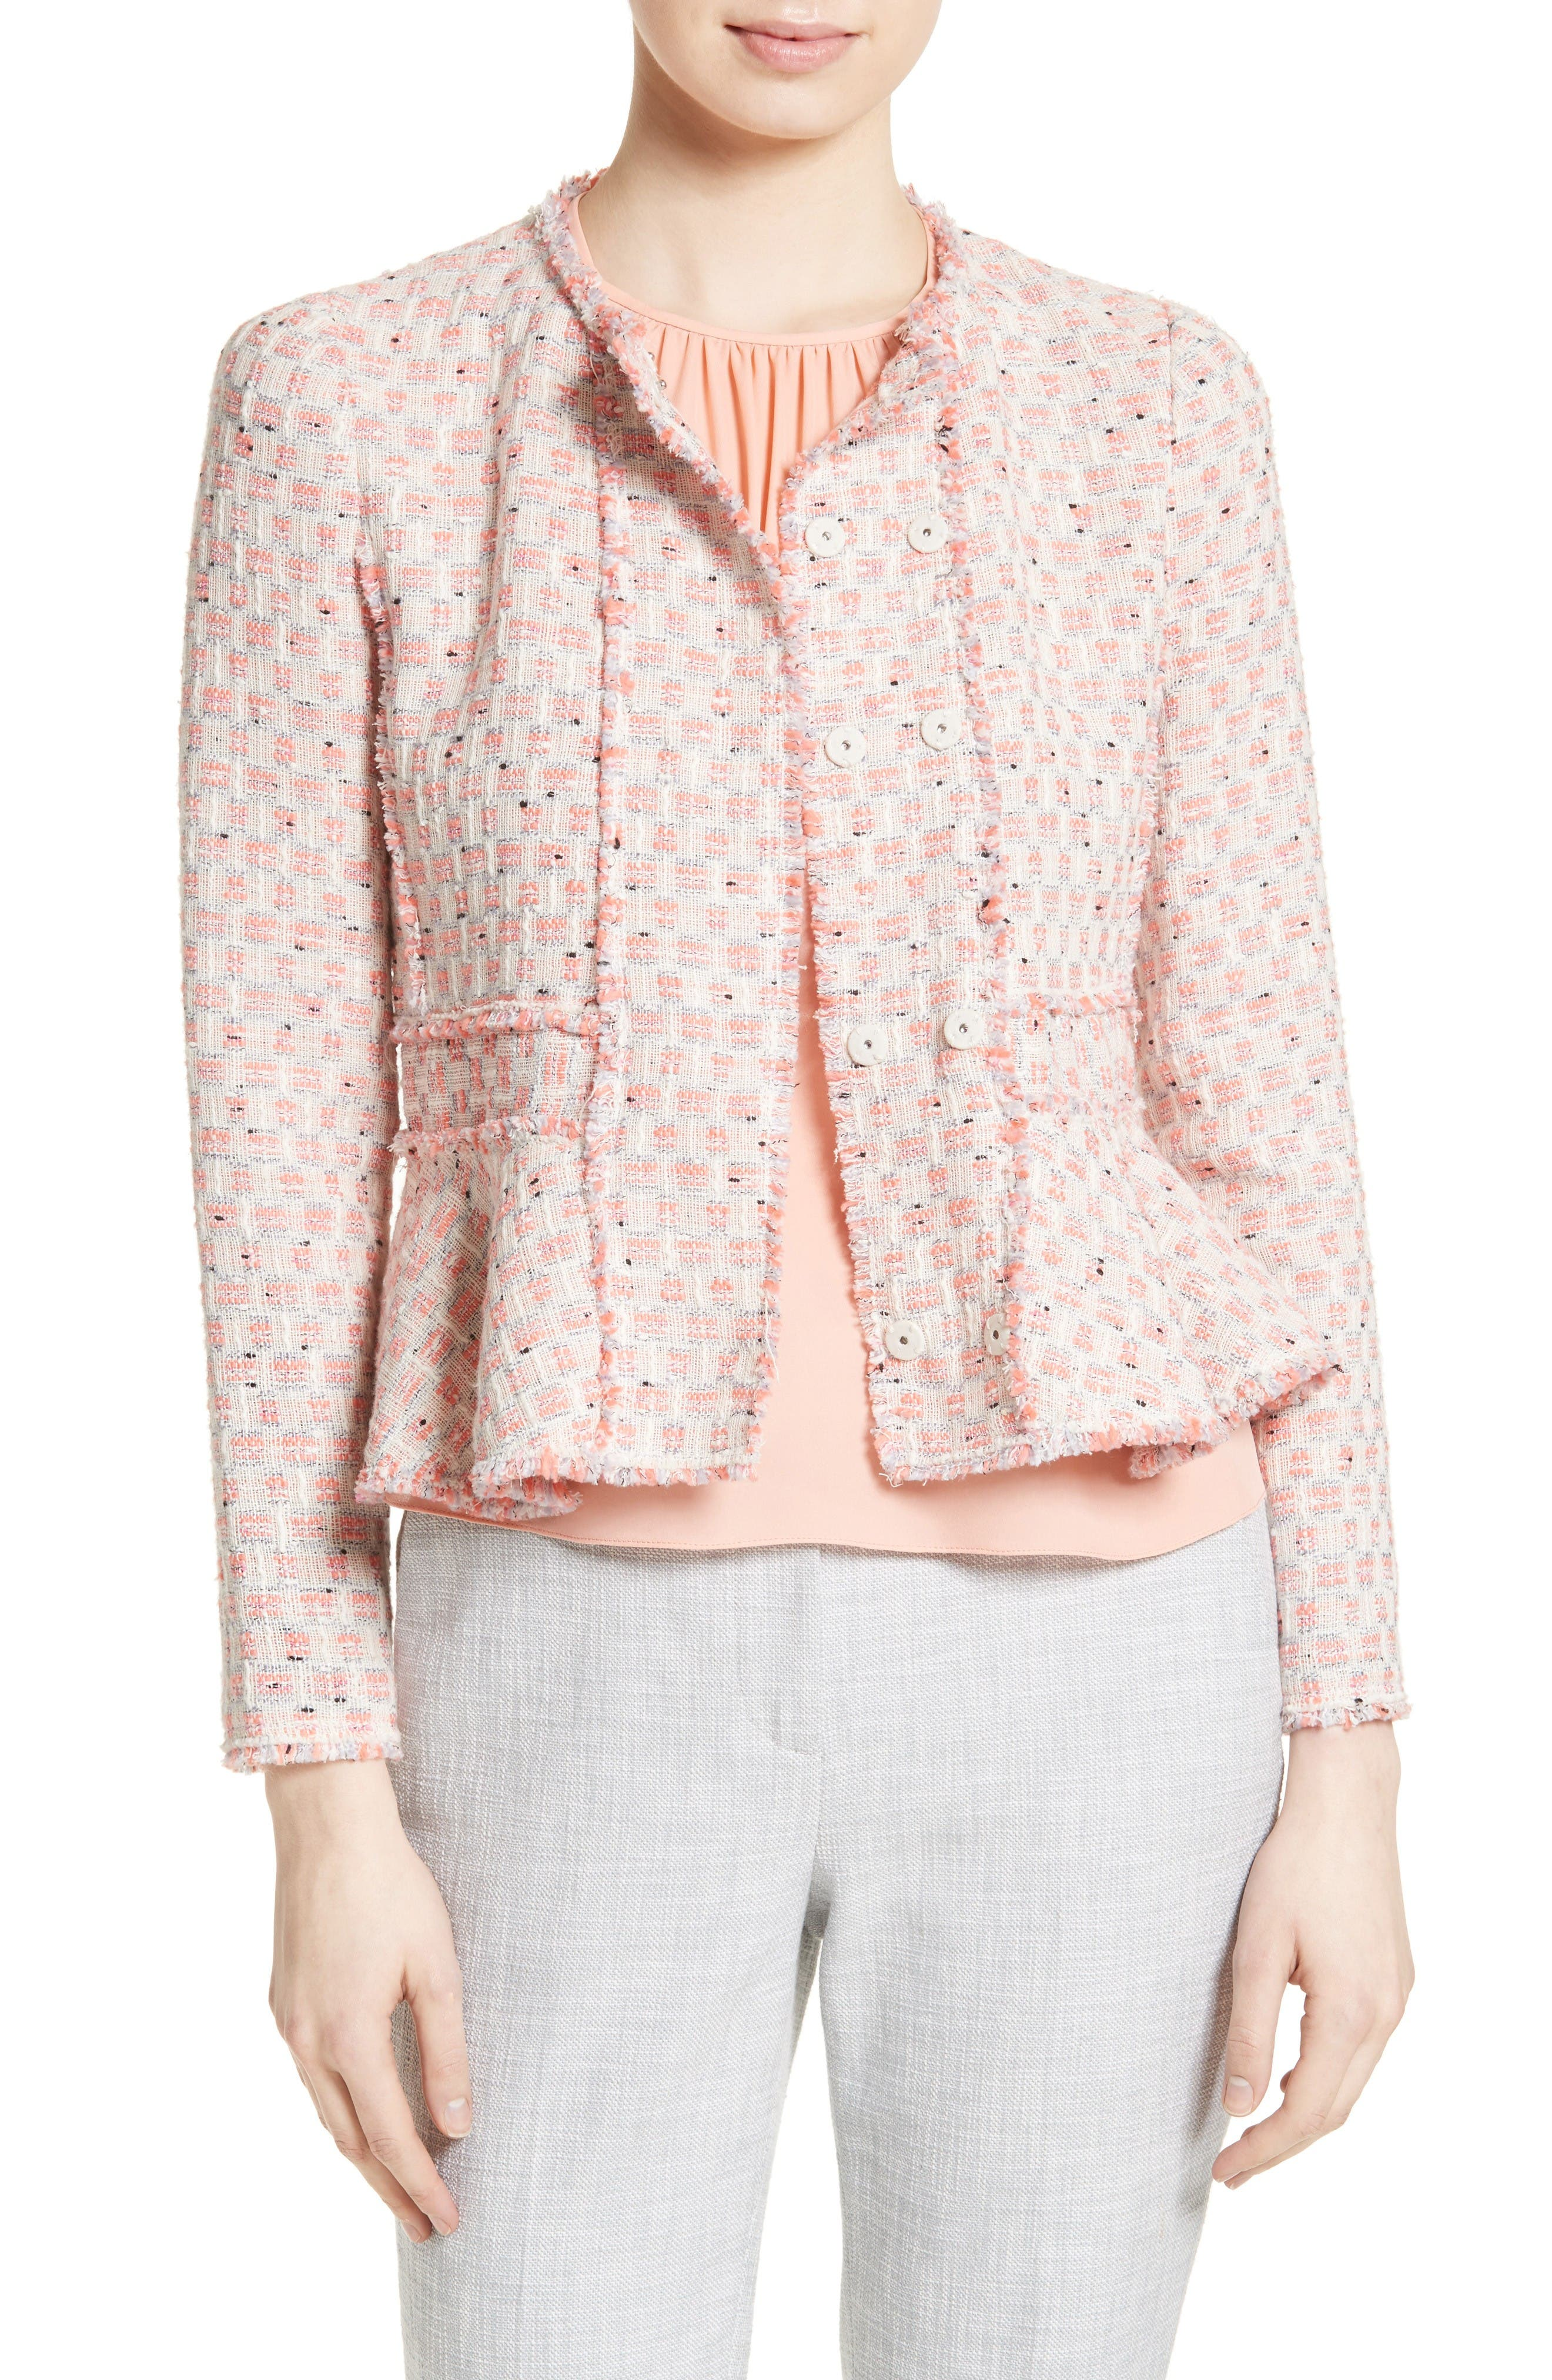 Alternate Image 1 Selected - Rebecca Taylor Tweed Peplum Jacket